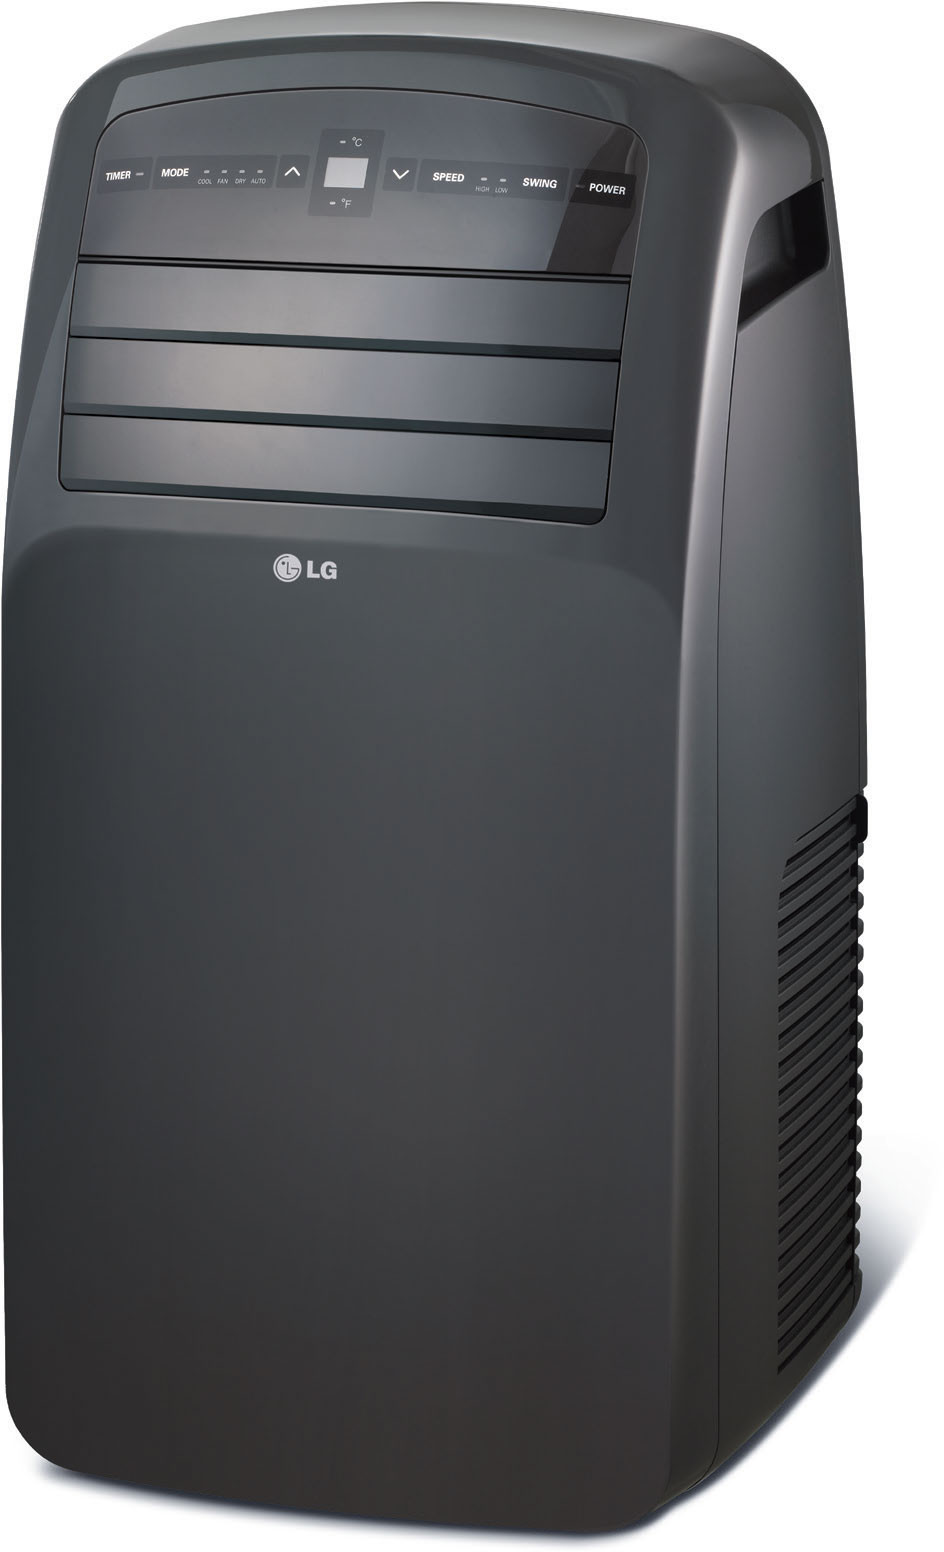 Lg Lp1214gxr 12 000 Btu Portable Air Conditioner With 9 4